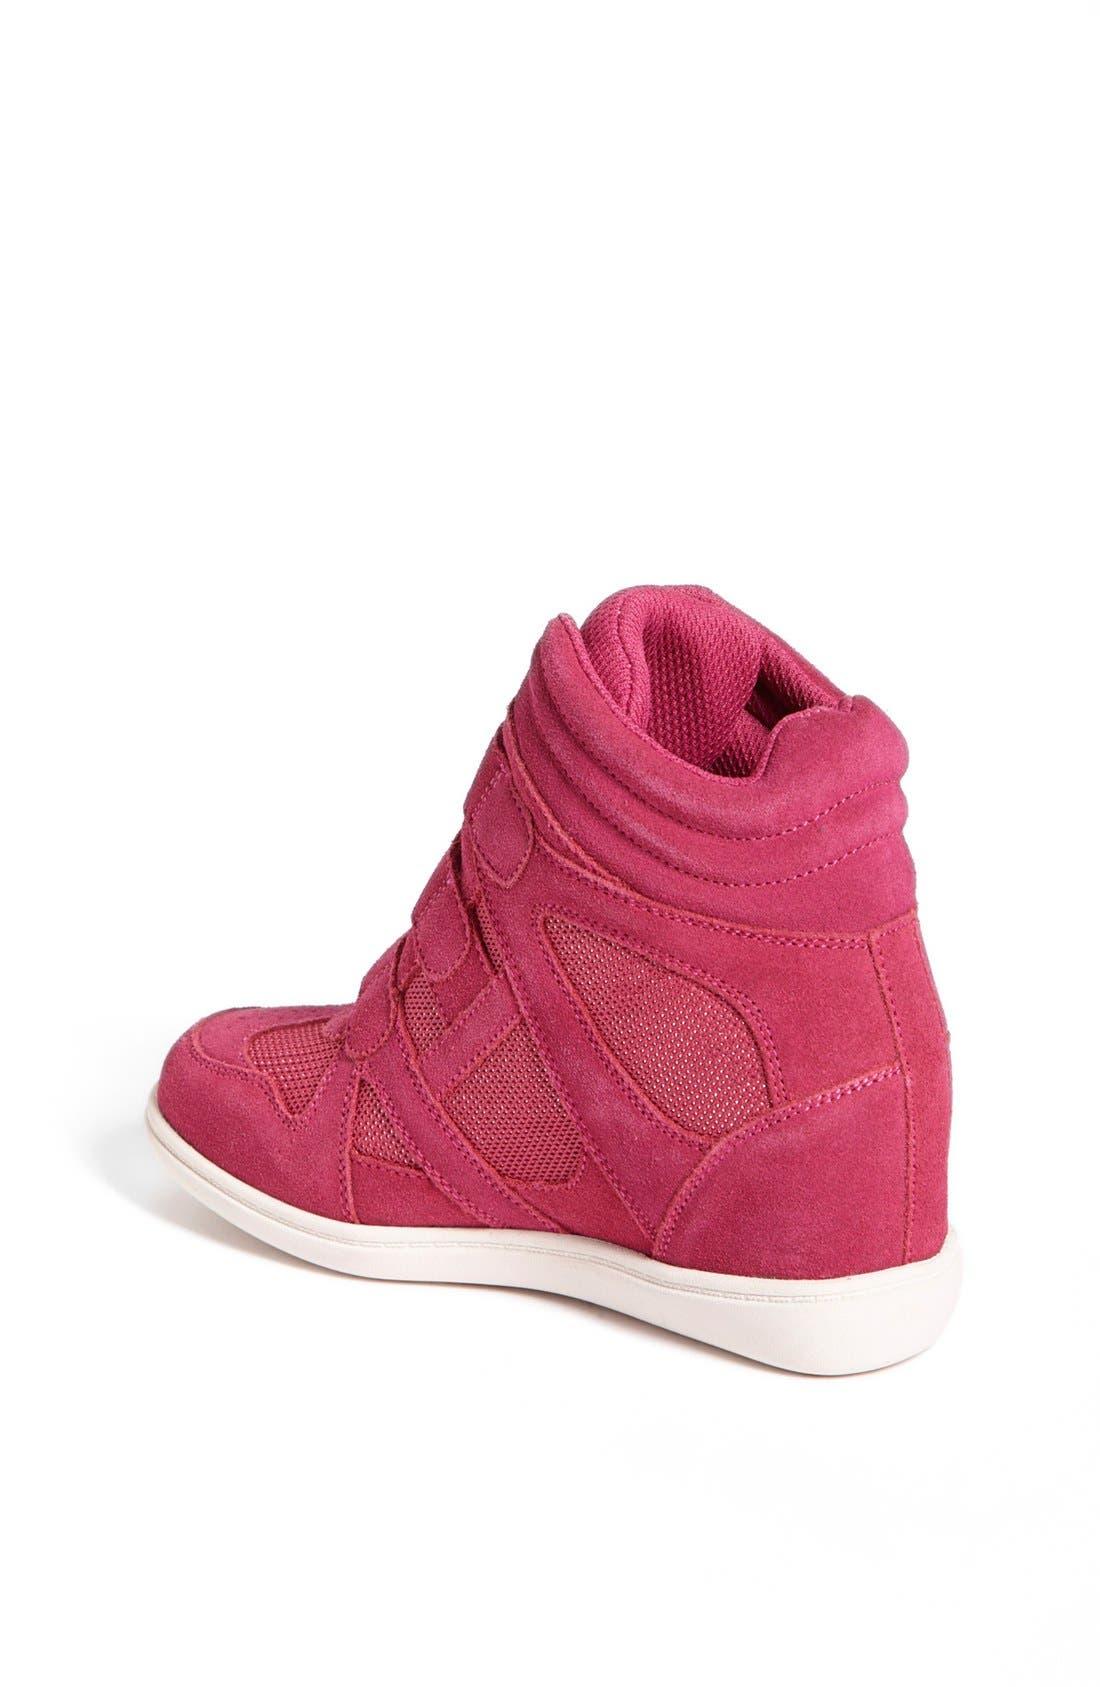 Alternate Image 2  - SKECHERS 'Double Trouble' Wedge Sneaker (Toddler, Little Kid & Big Kid)